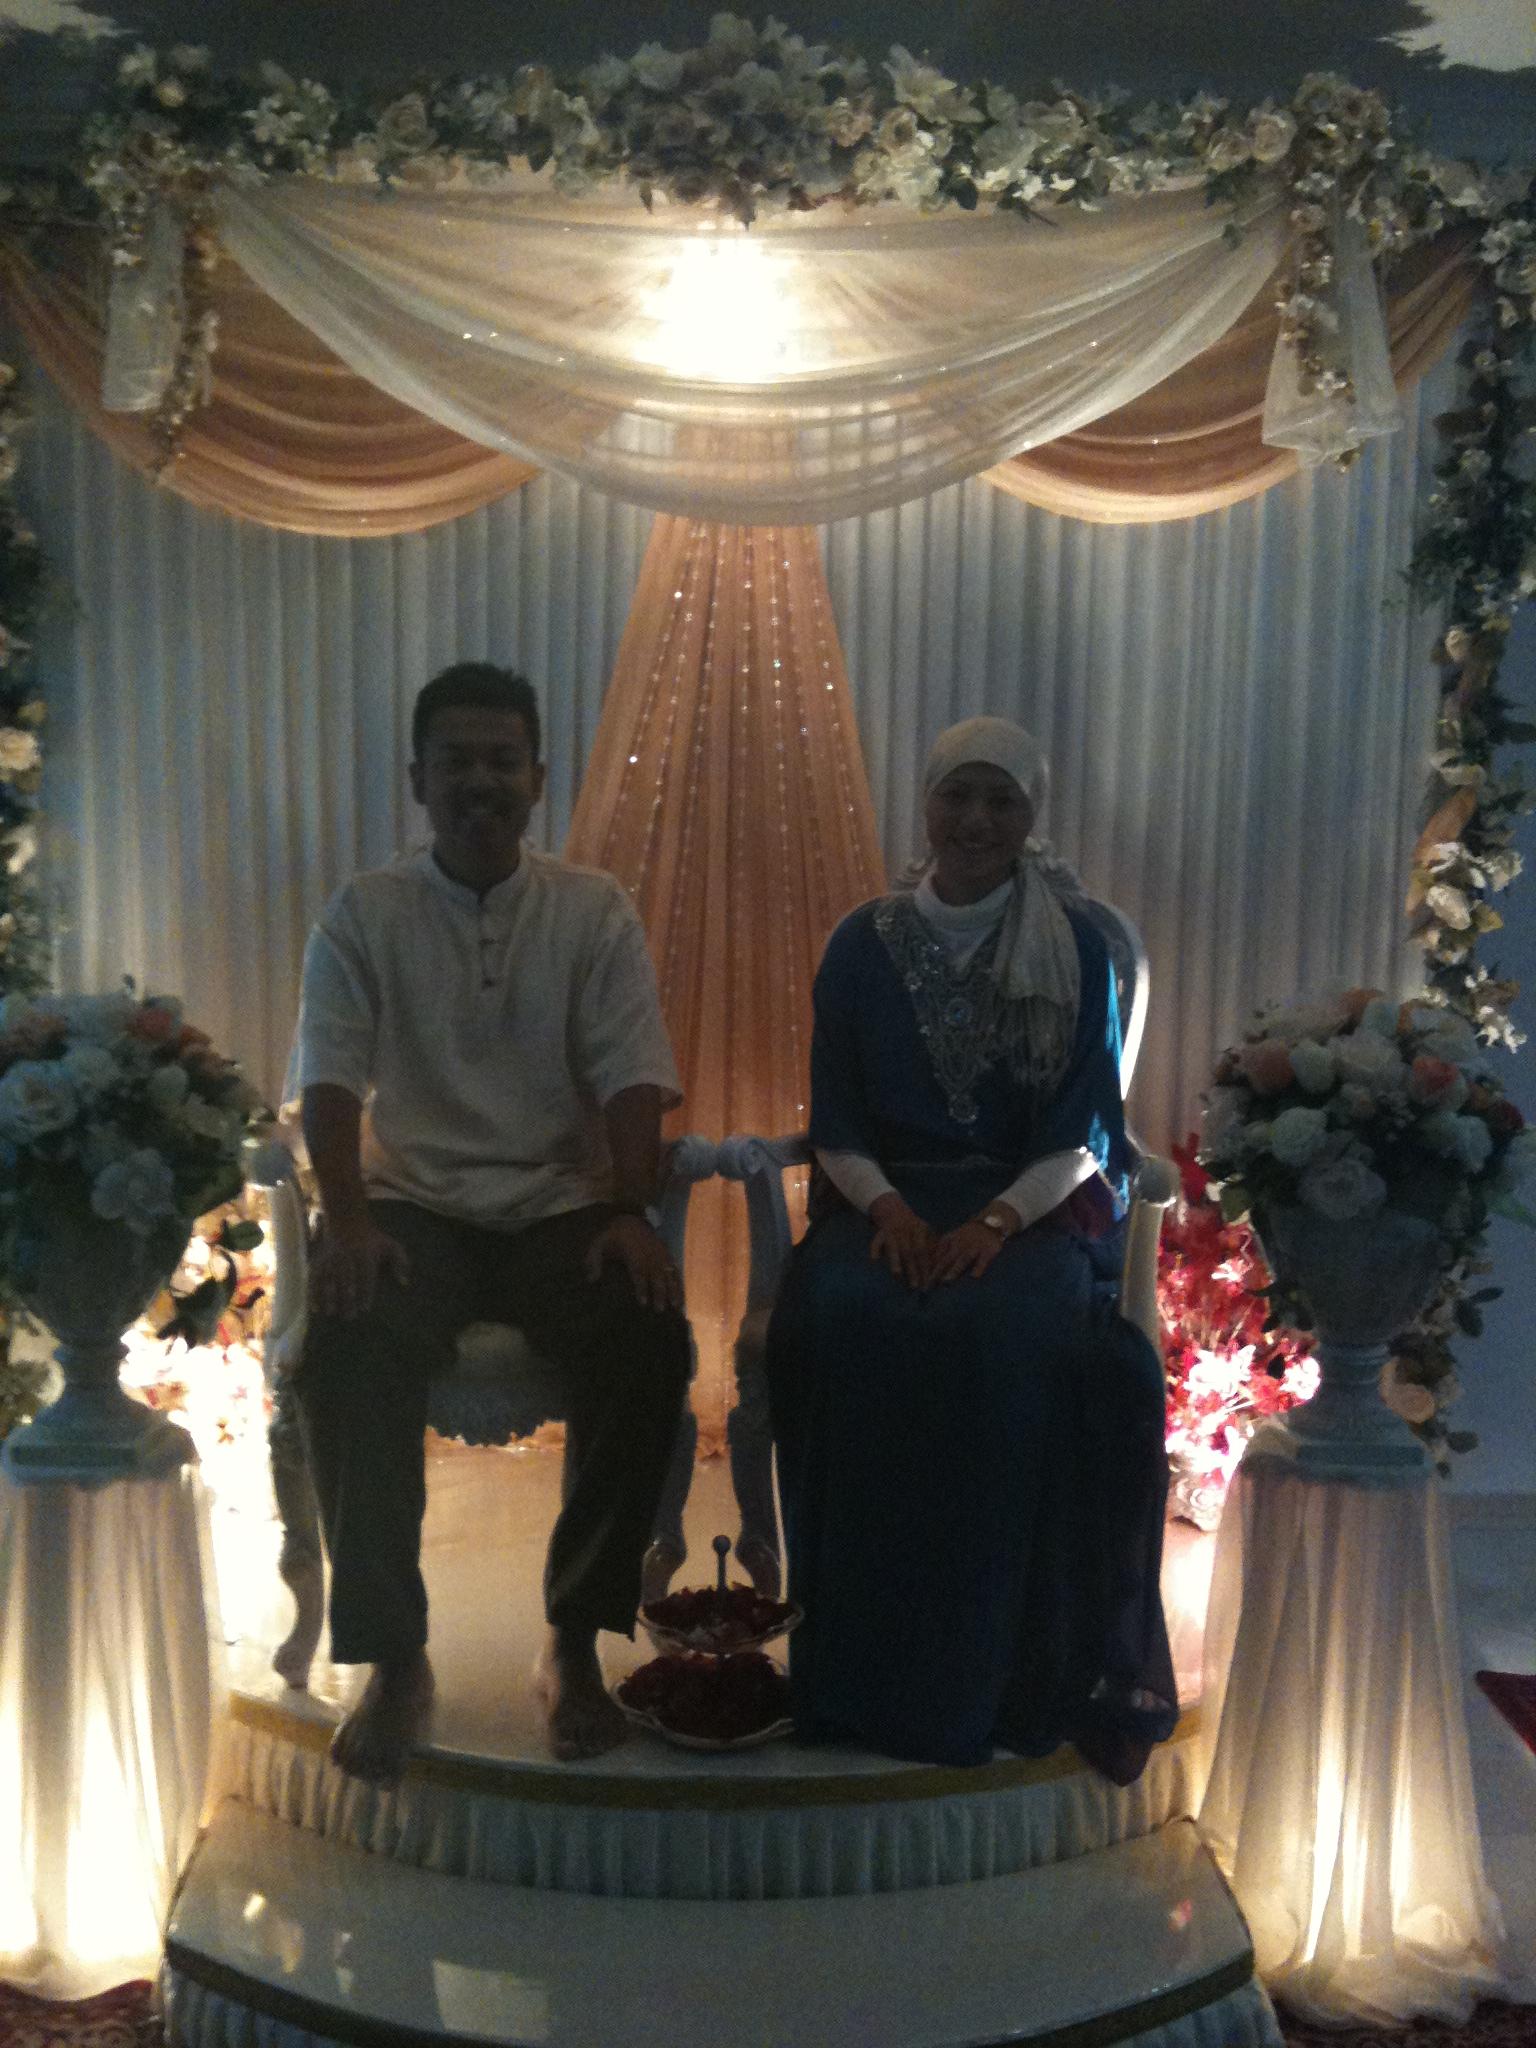 Henna Party Before Wedding : The mehndi party night before wedding ahmad ali